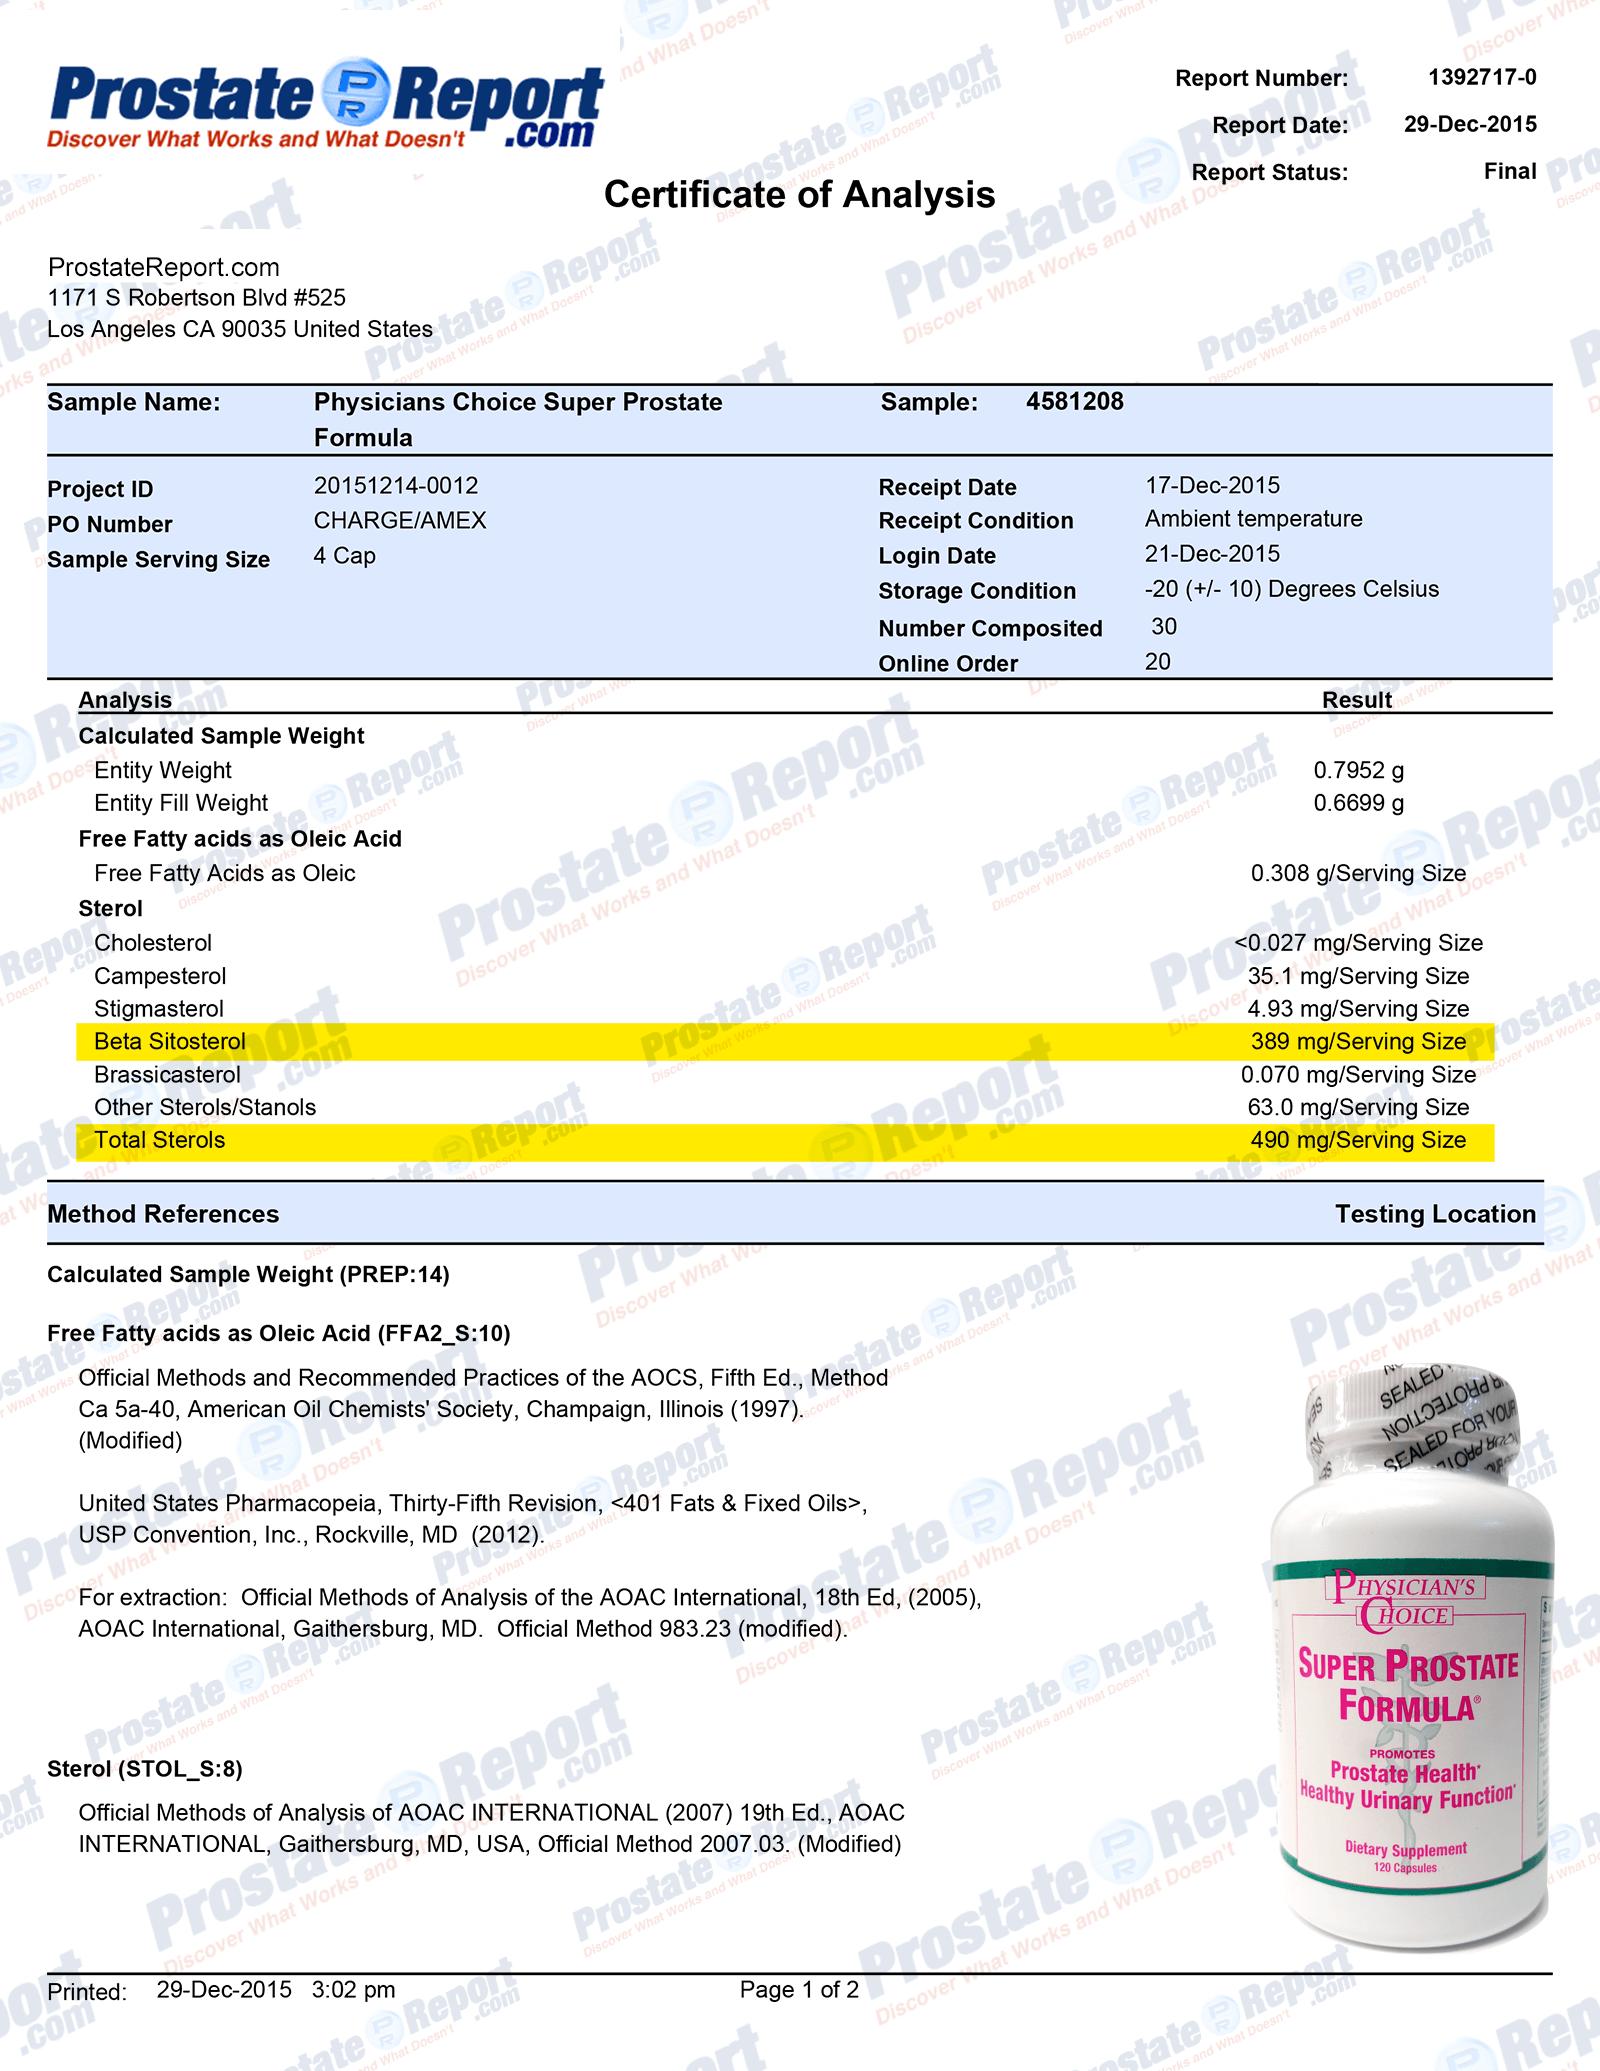 Super Prostate Formula lab report